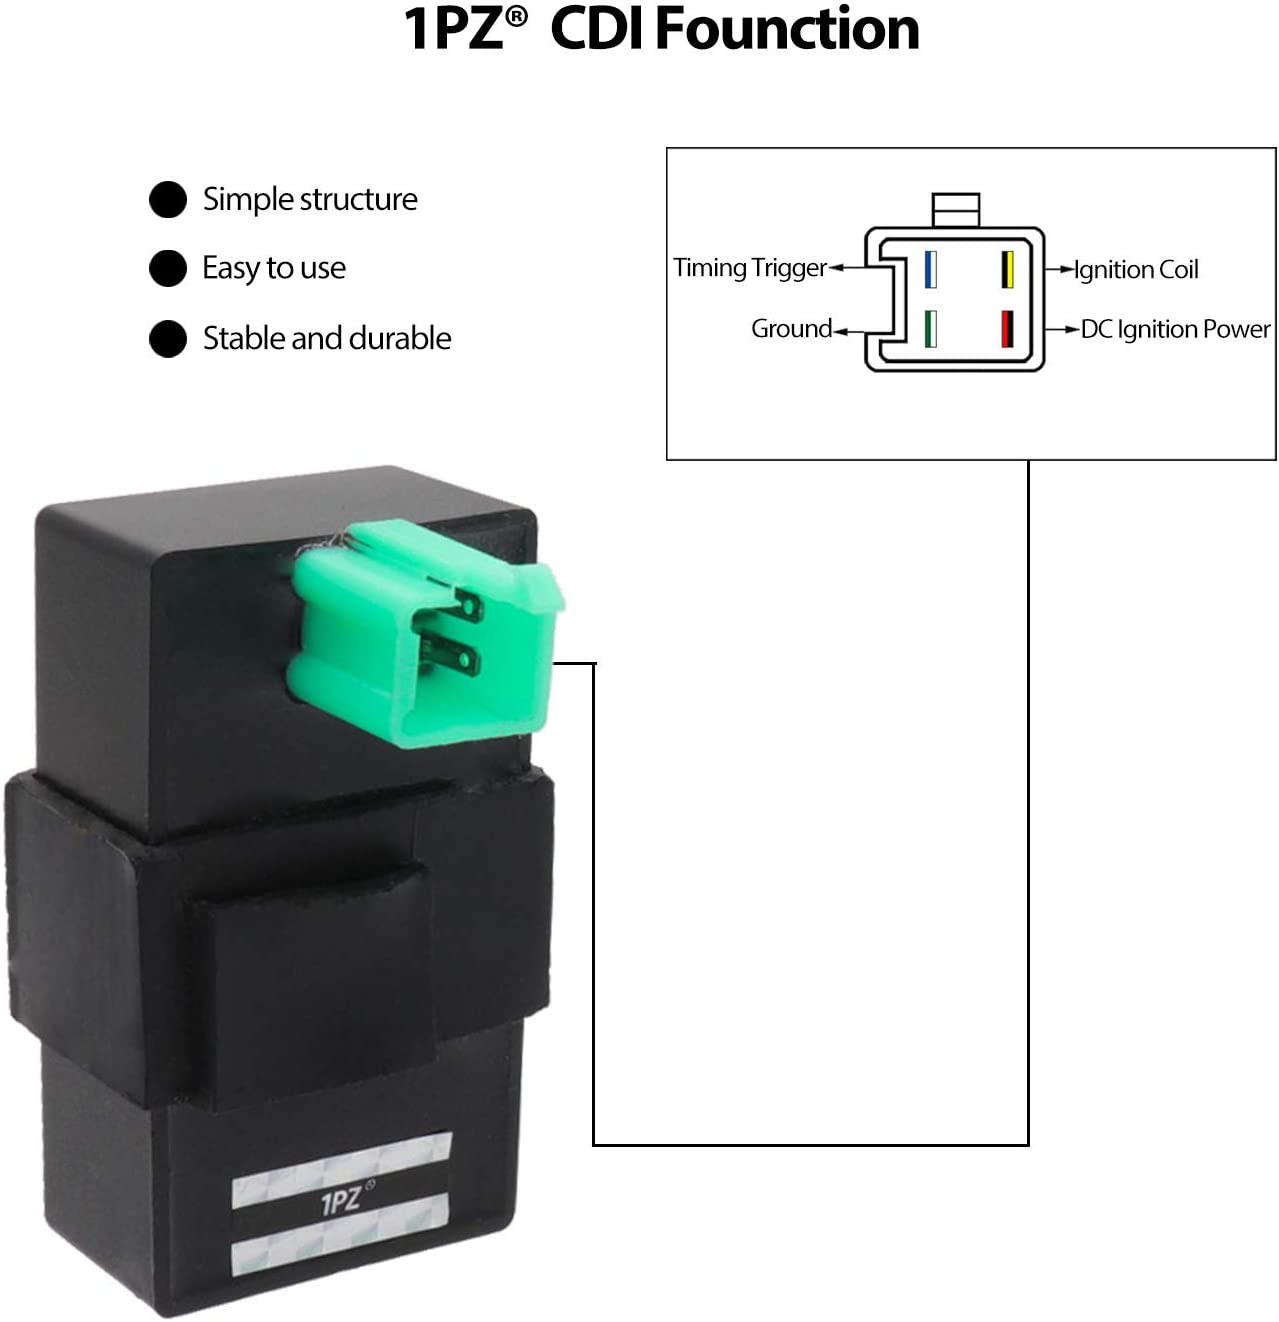 6 Pin Cdi Box Wiring Diagram from images-na.ssl-images-amazon.com